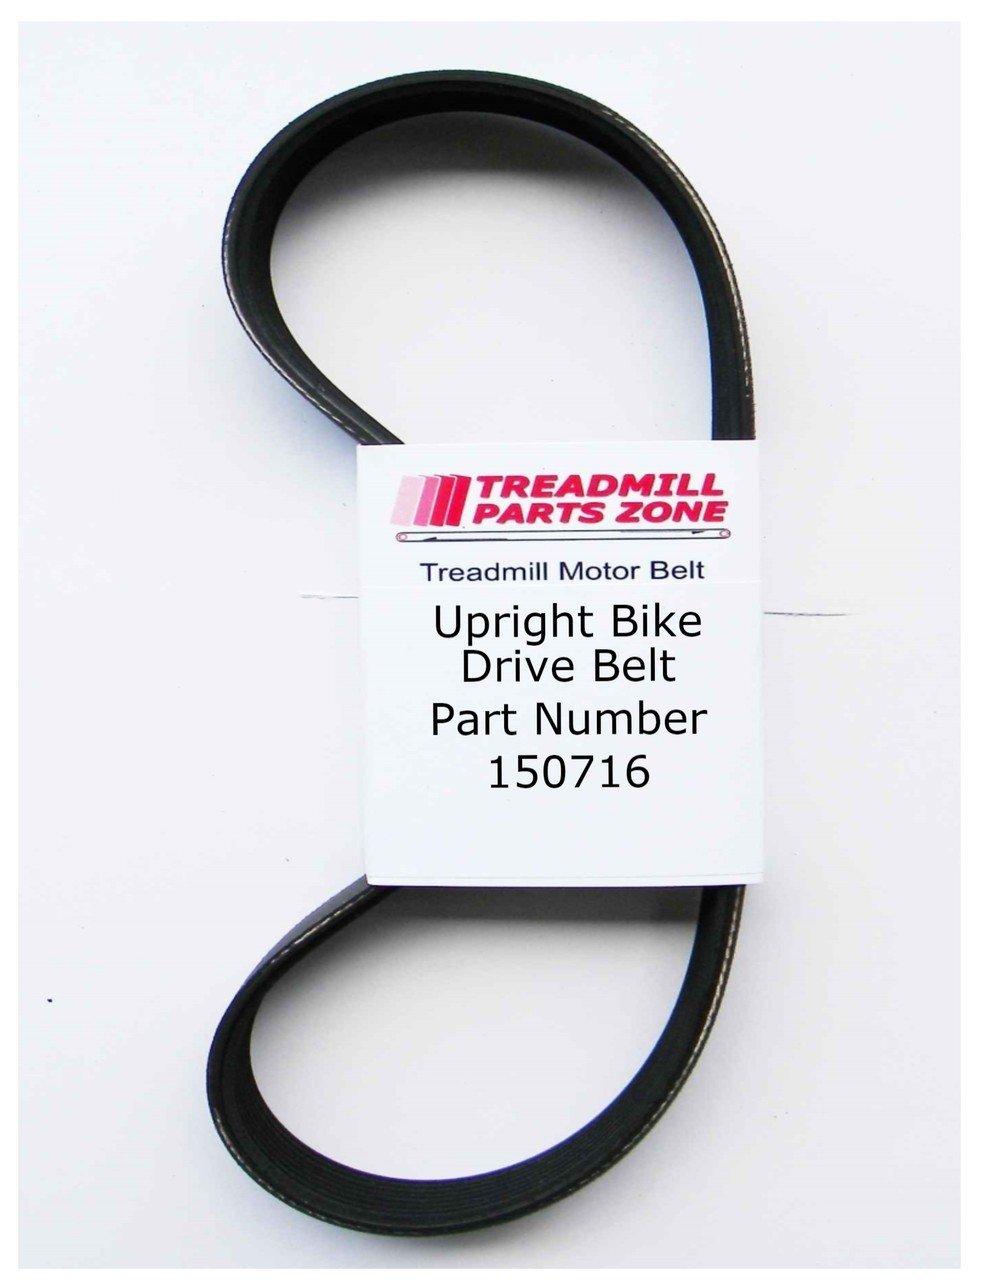 Pro Form Sears Model 212570 DUAL TRAINER Upright Bike Drive Belt Part Number 150716/ROWER